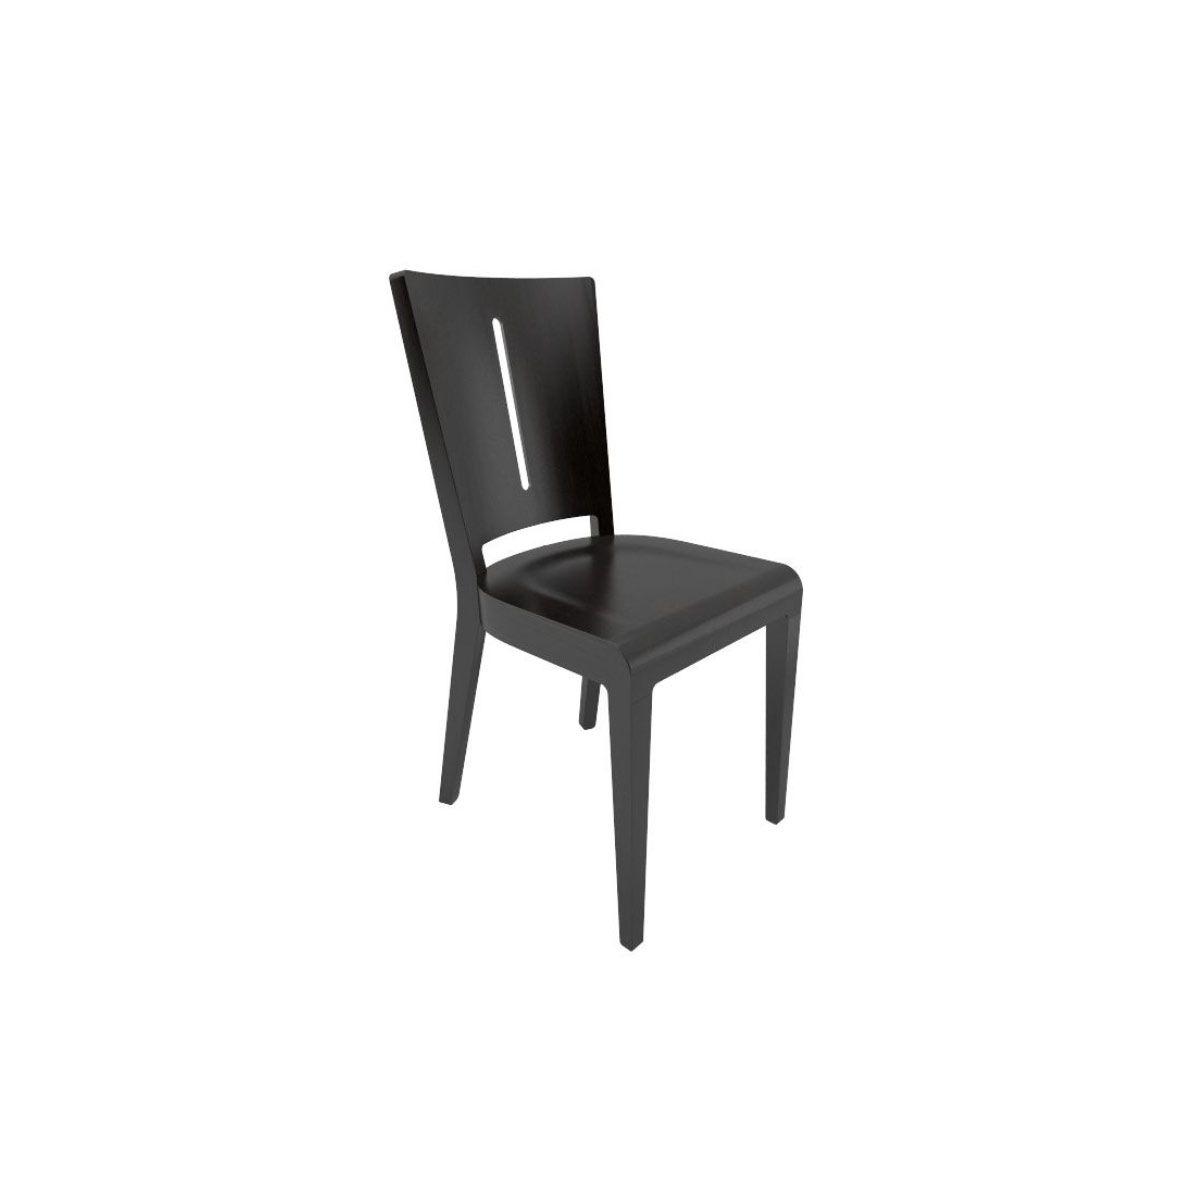 La chaise de bistrot deco maison design for La chaise design